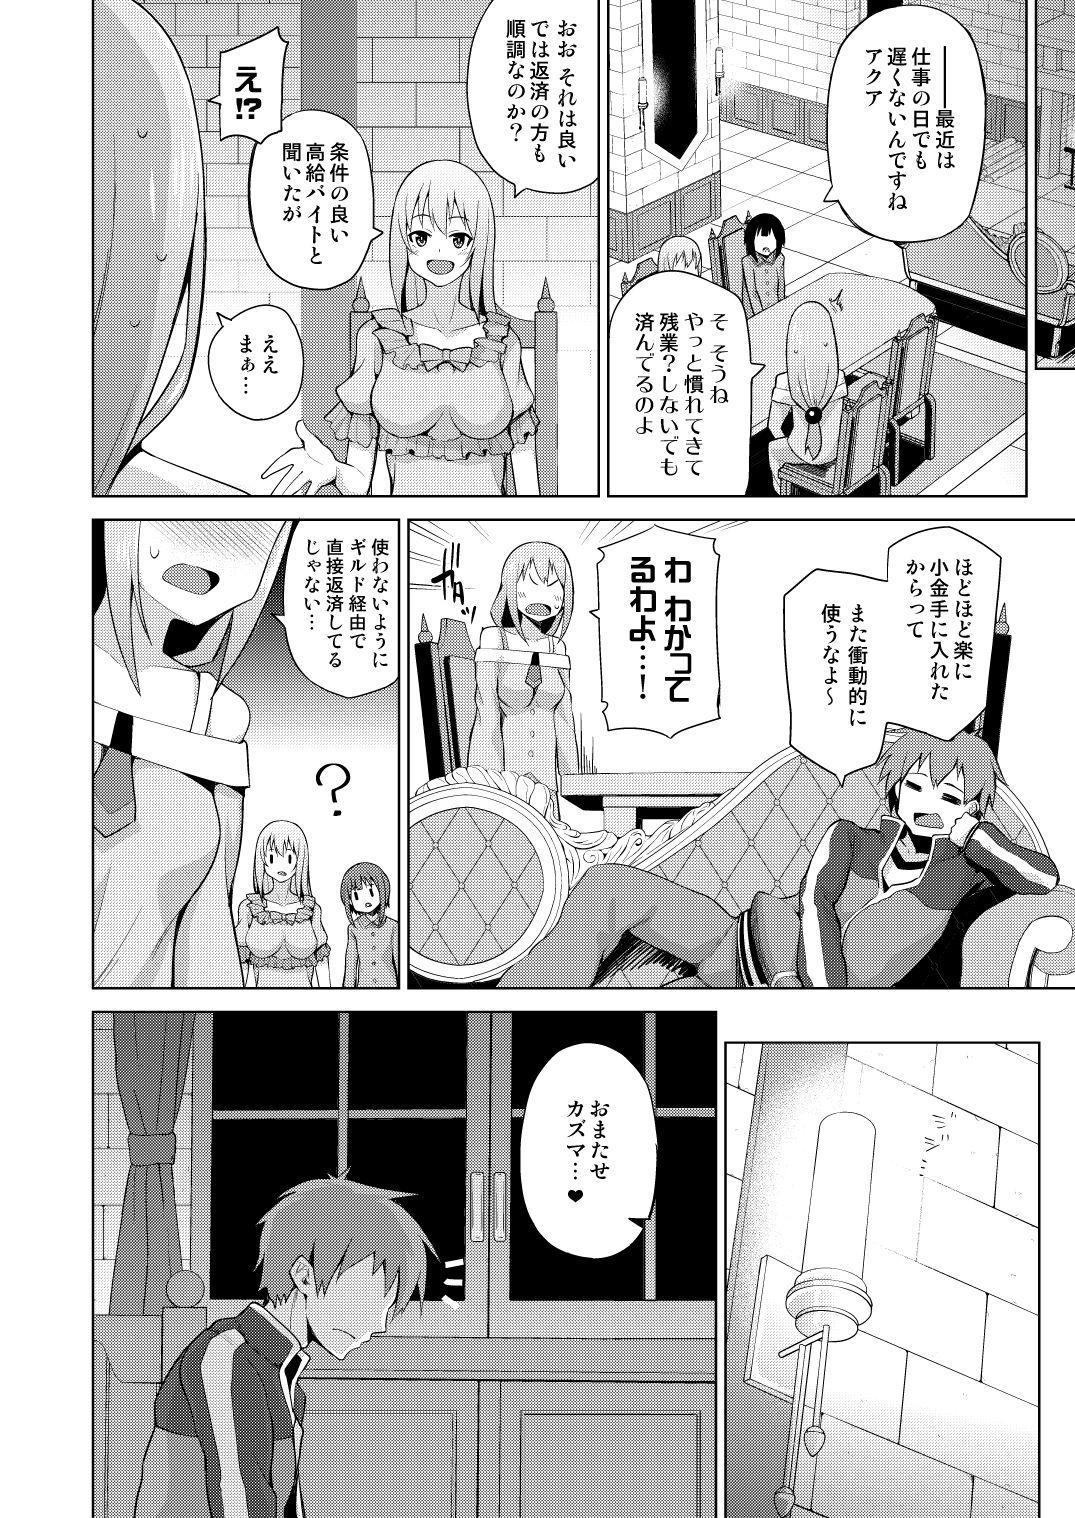 Damegami-sama no Succubus Beit! 17